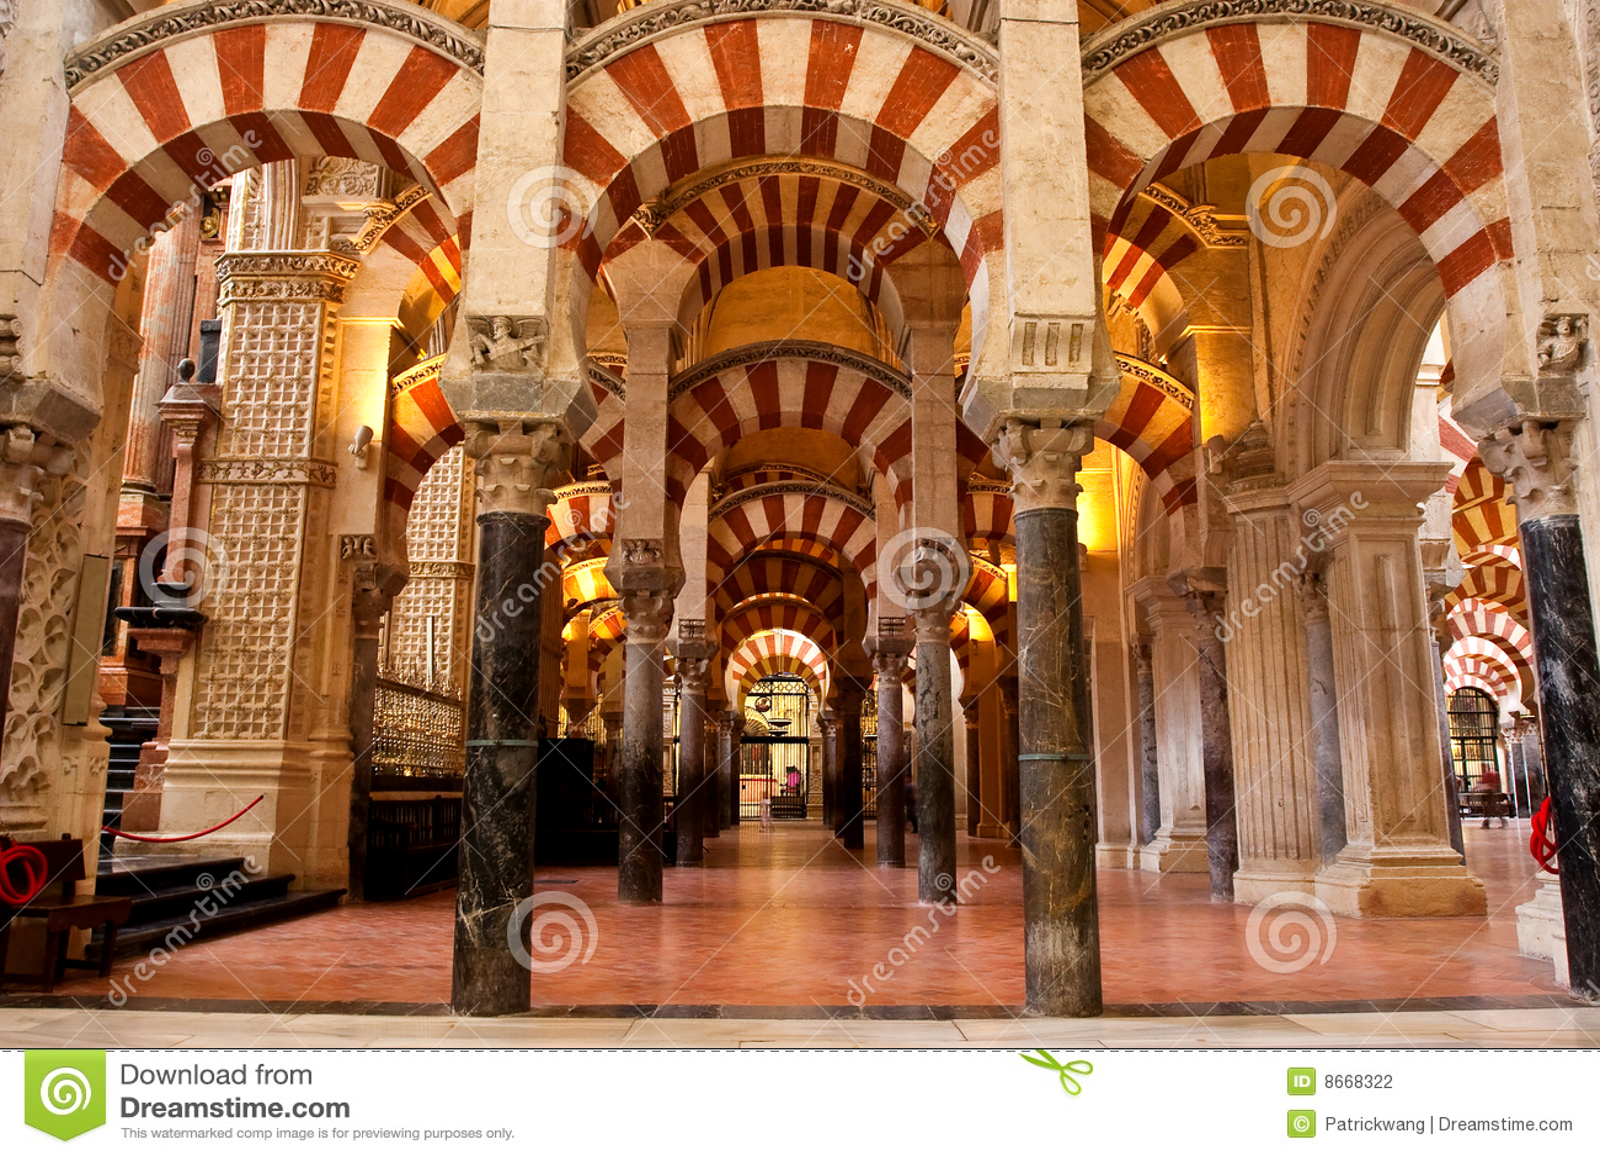 Mezquita of cordoba stock photo image of spanish roman for Decoracion cordoba